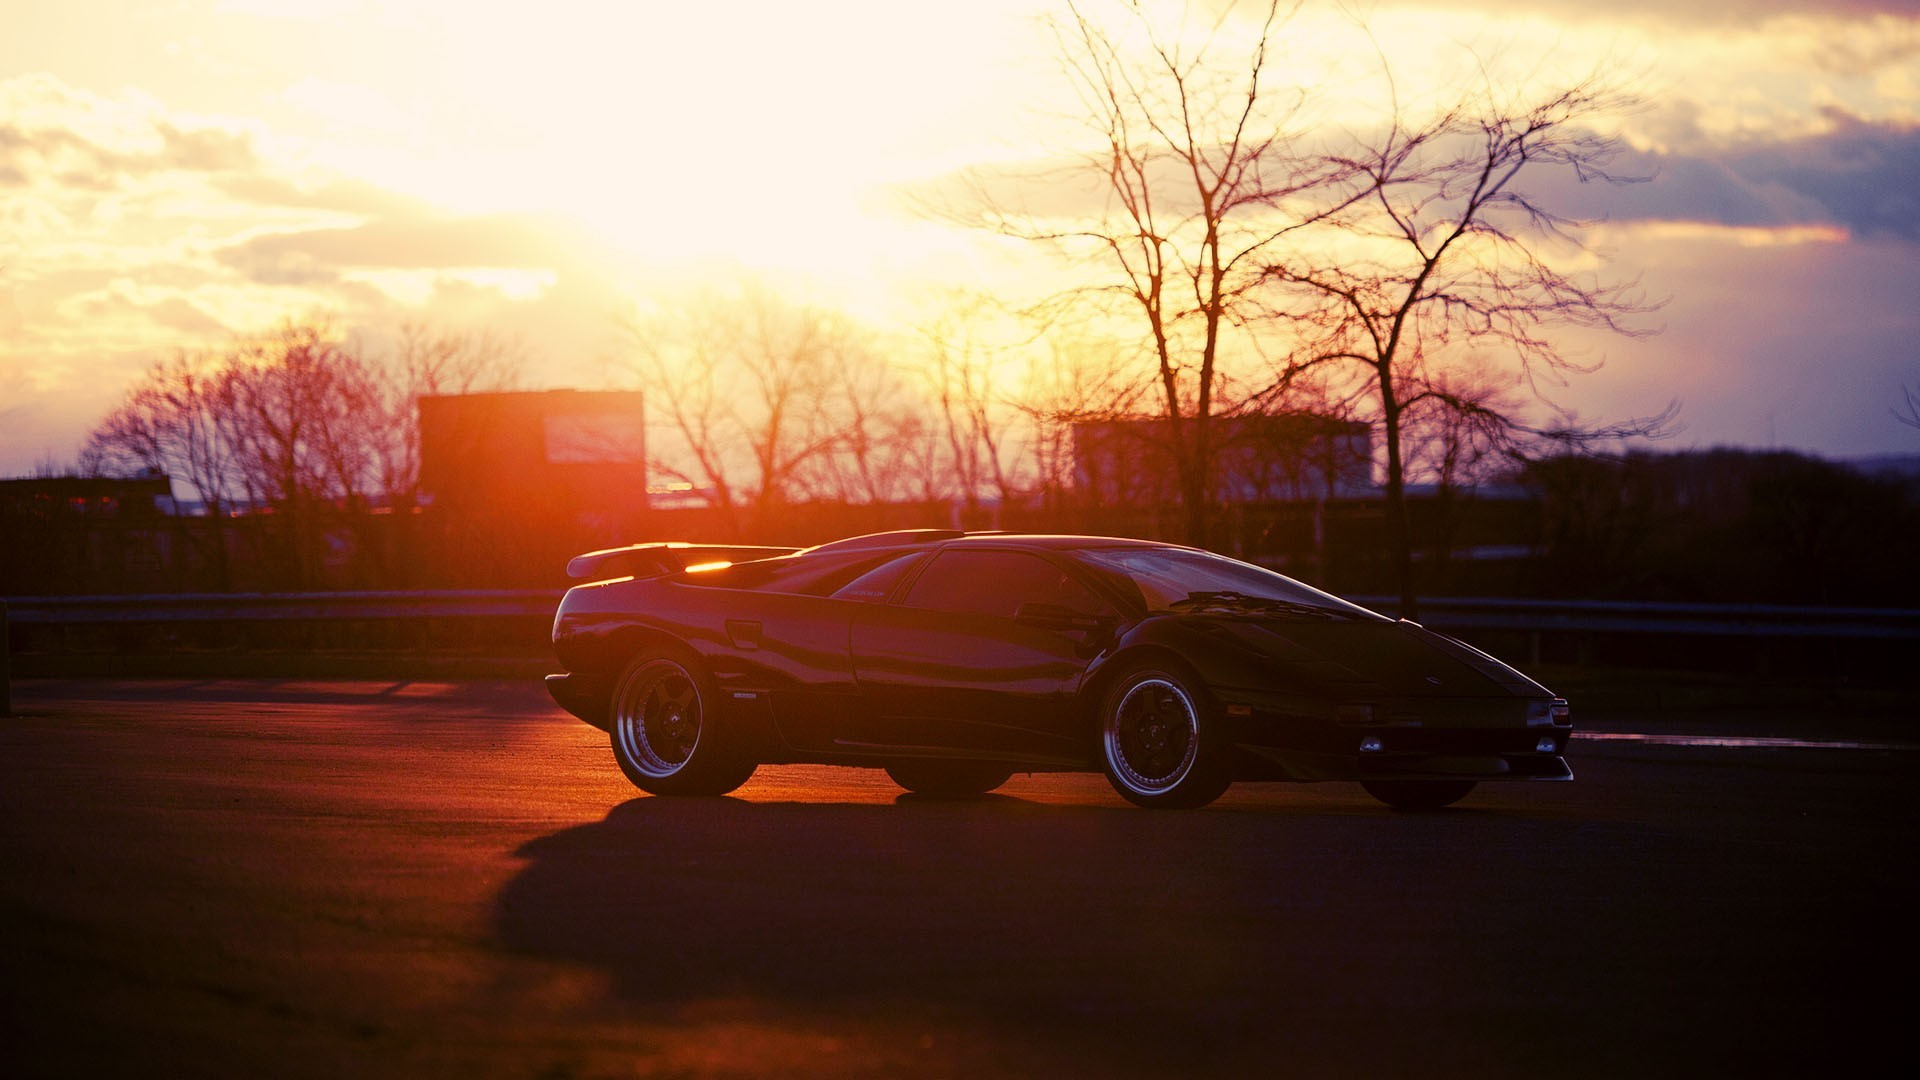 General 1920x1080 car Lamborghini Diablo Sv Lamborghini vehicle supercars pop-up headlights sunlight